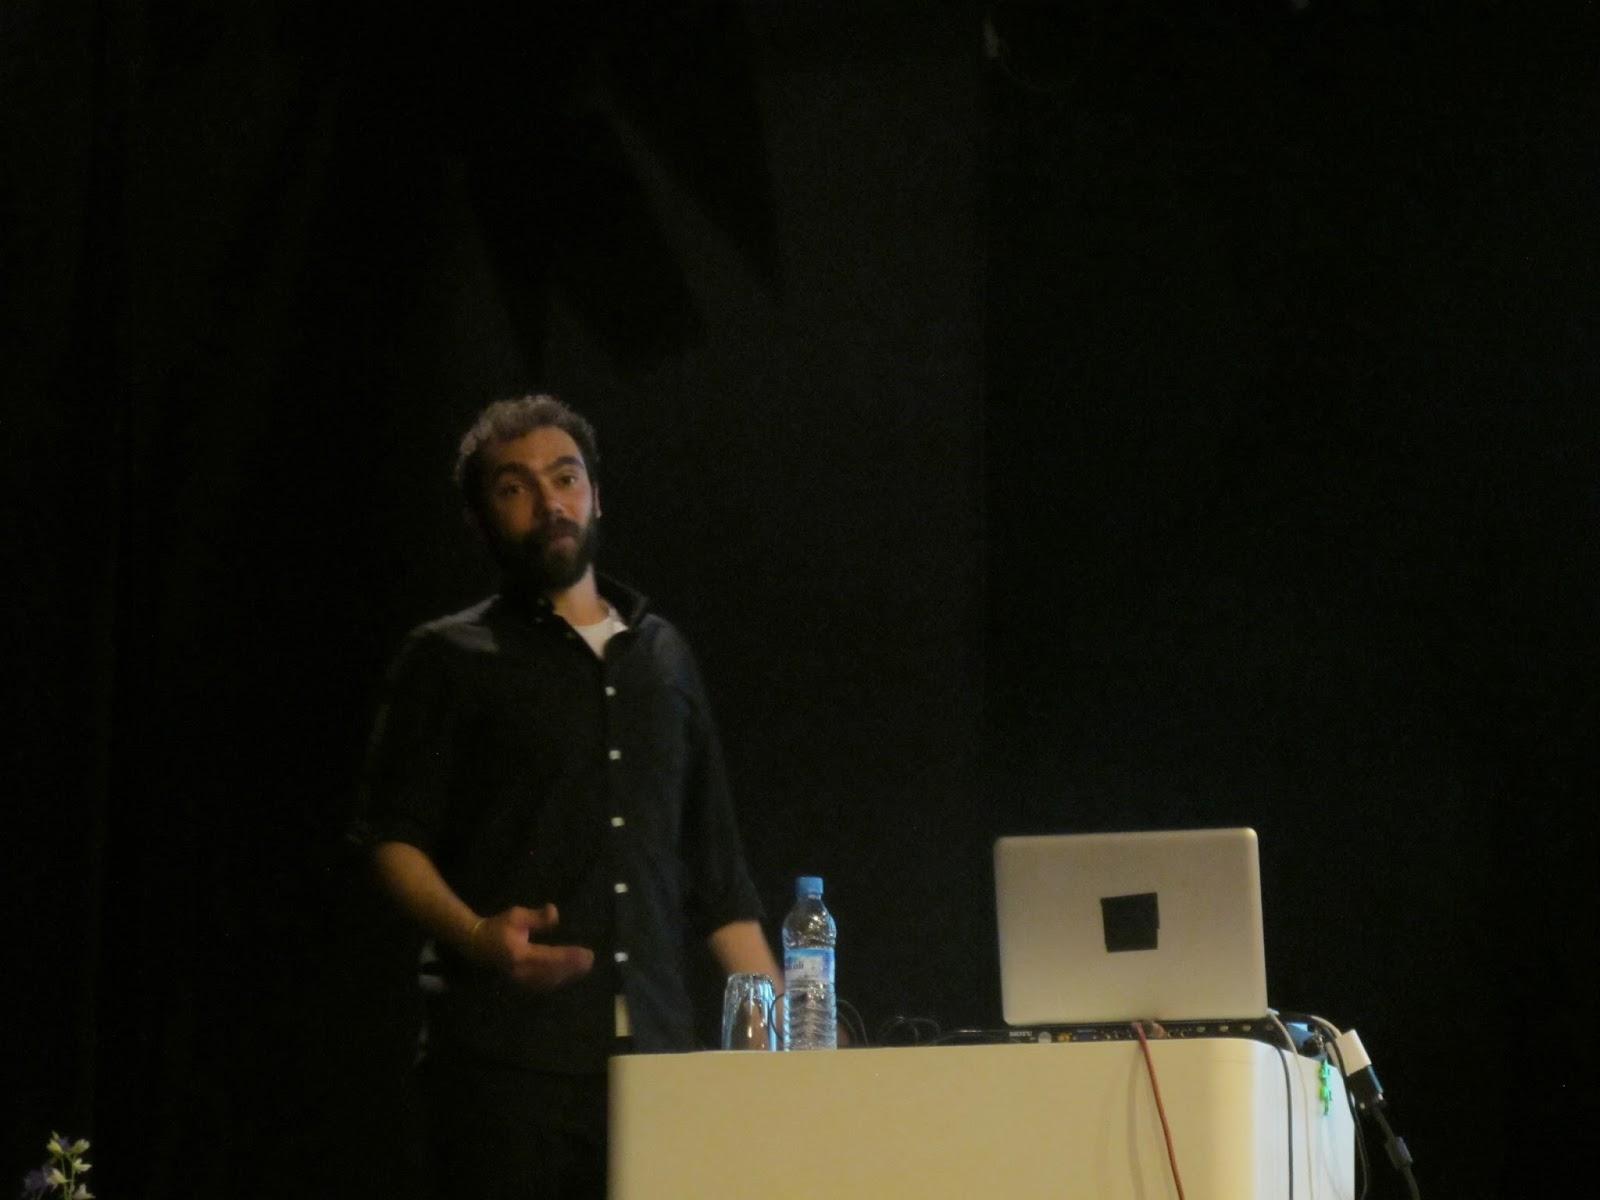 Lecture at IES Severo Ochoa (Tangier, Morocco)